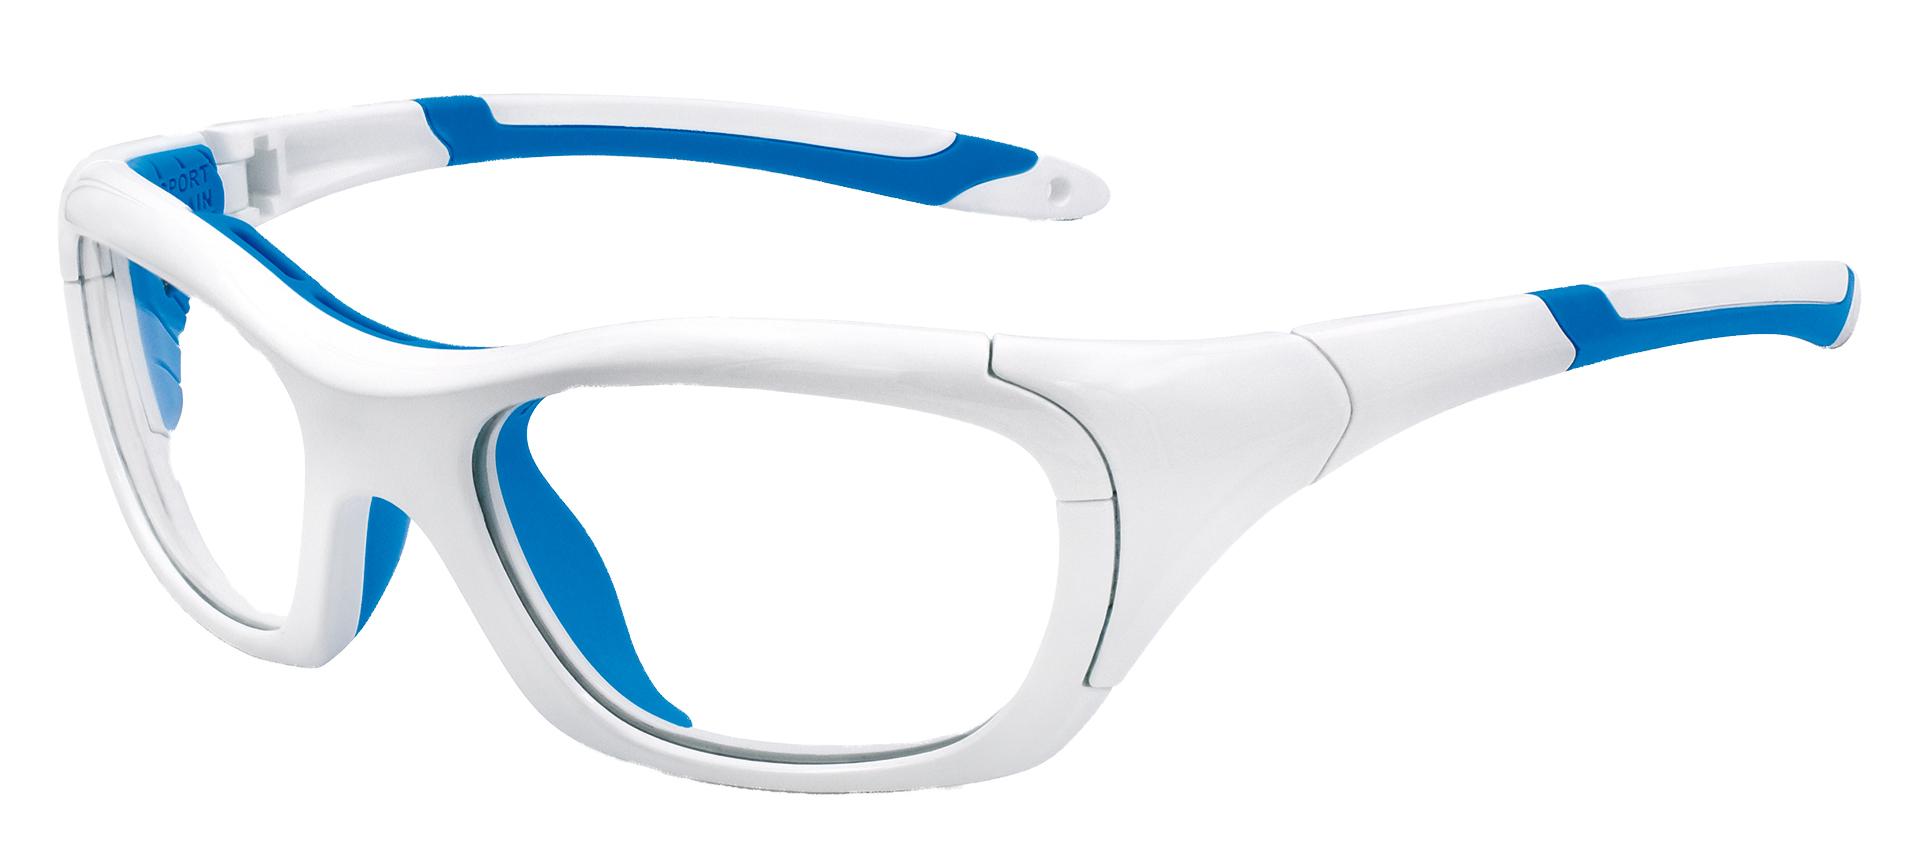 203fa17813 Eyewear for Kids - 8-10 years - Optiwow